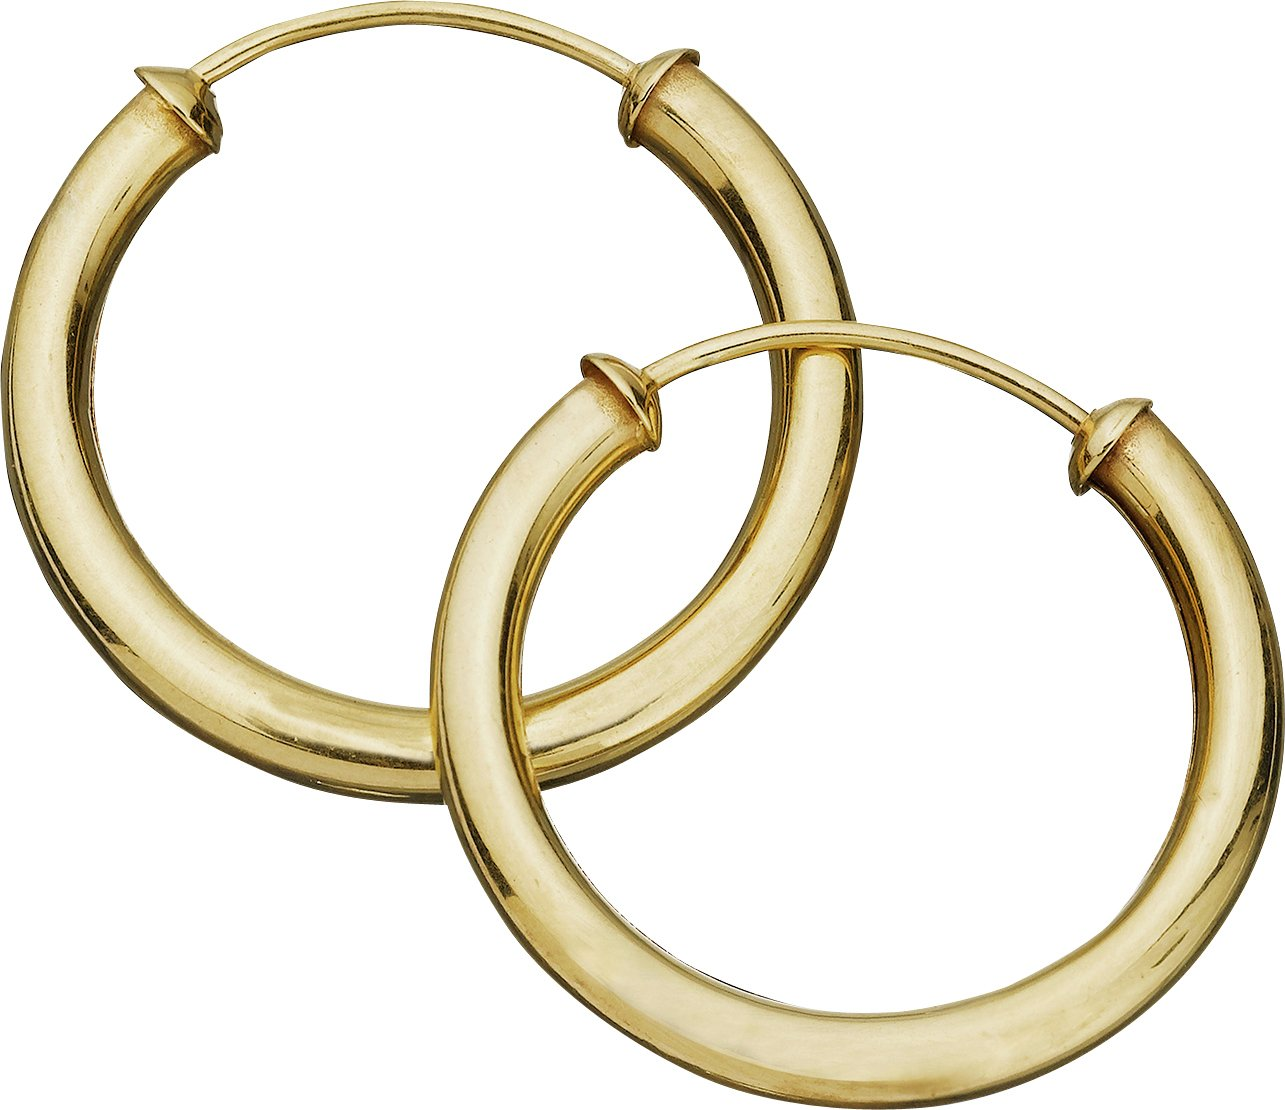 Buy Revere 9ct Gold Capped Hoop Earrings at Argos Your